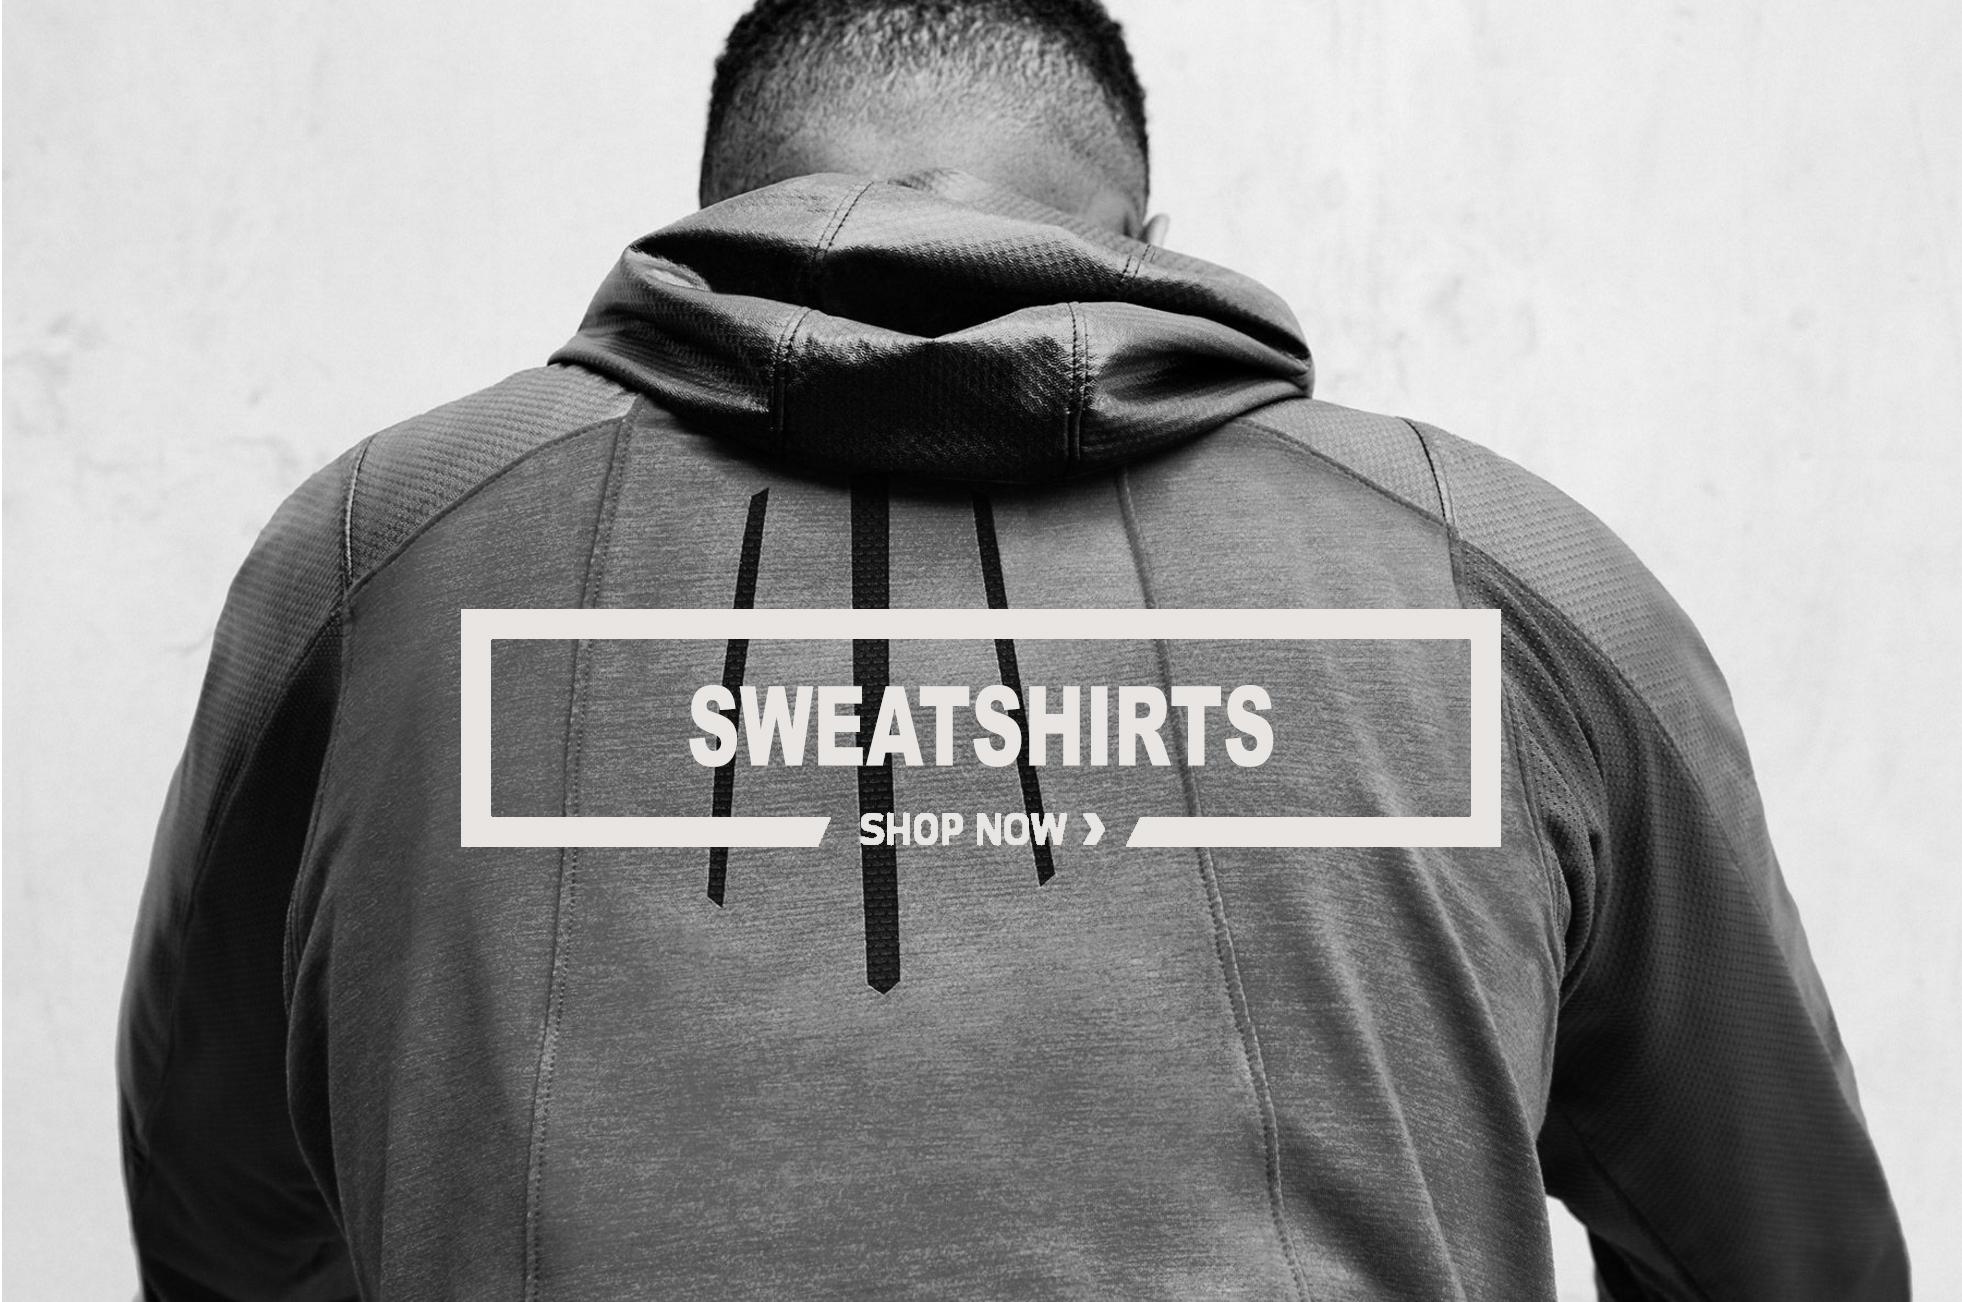 sweatshirts_c.jpg